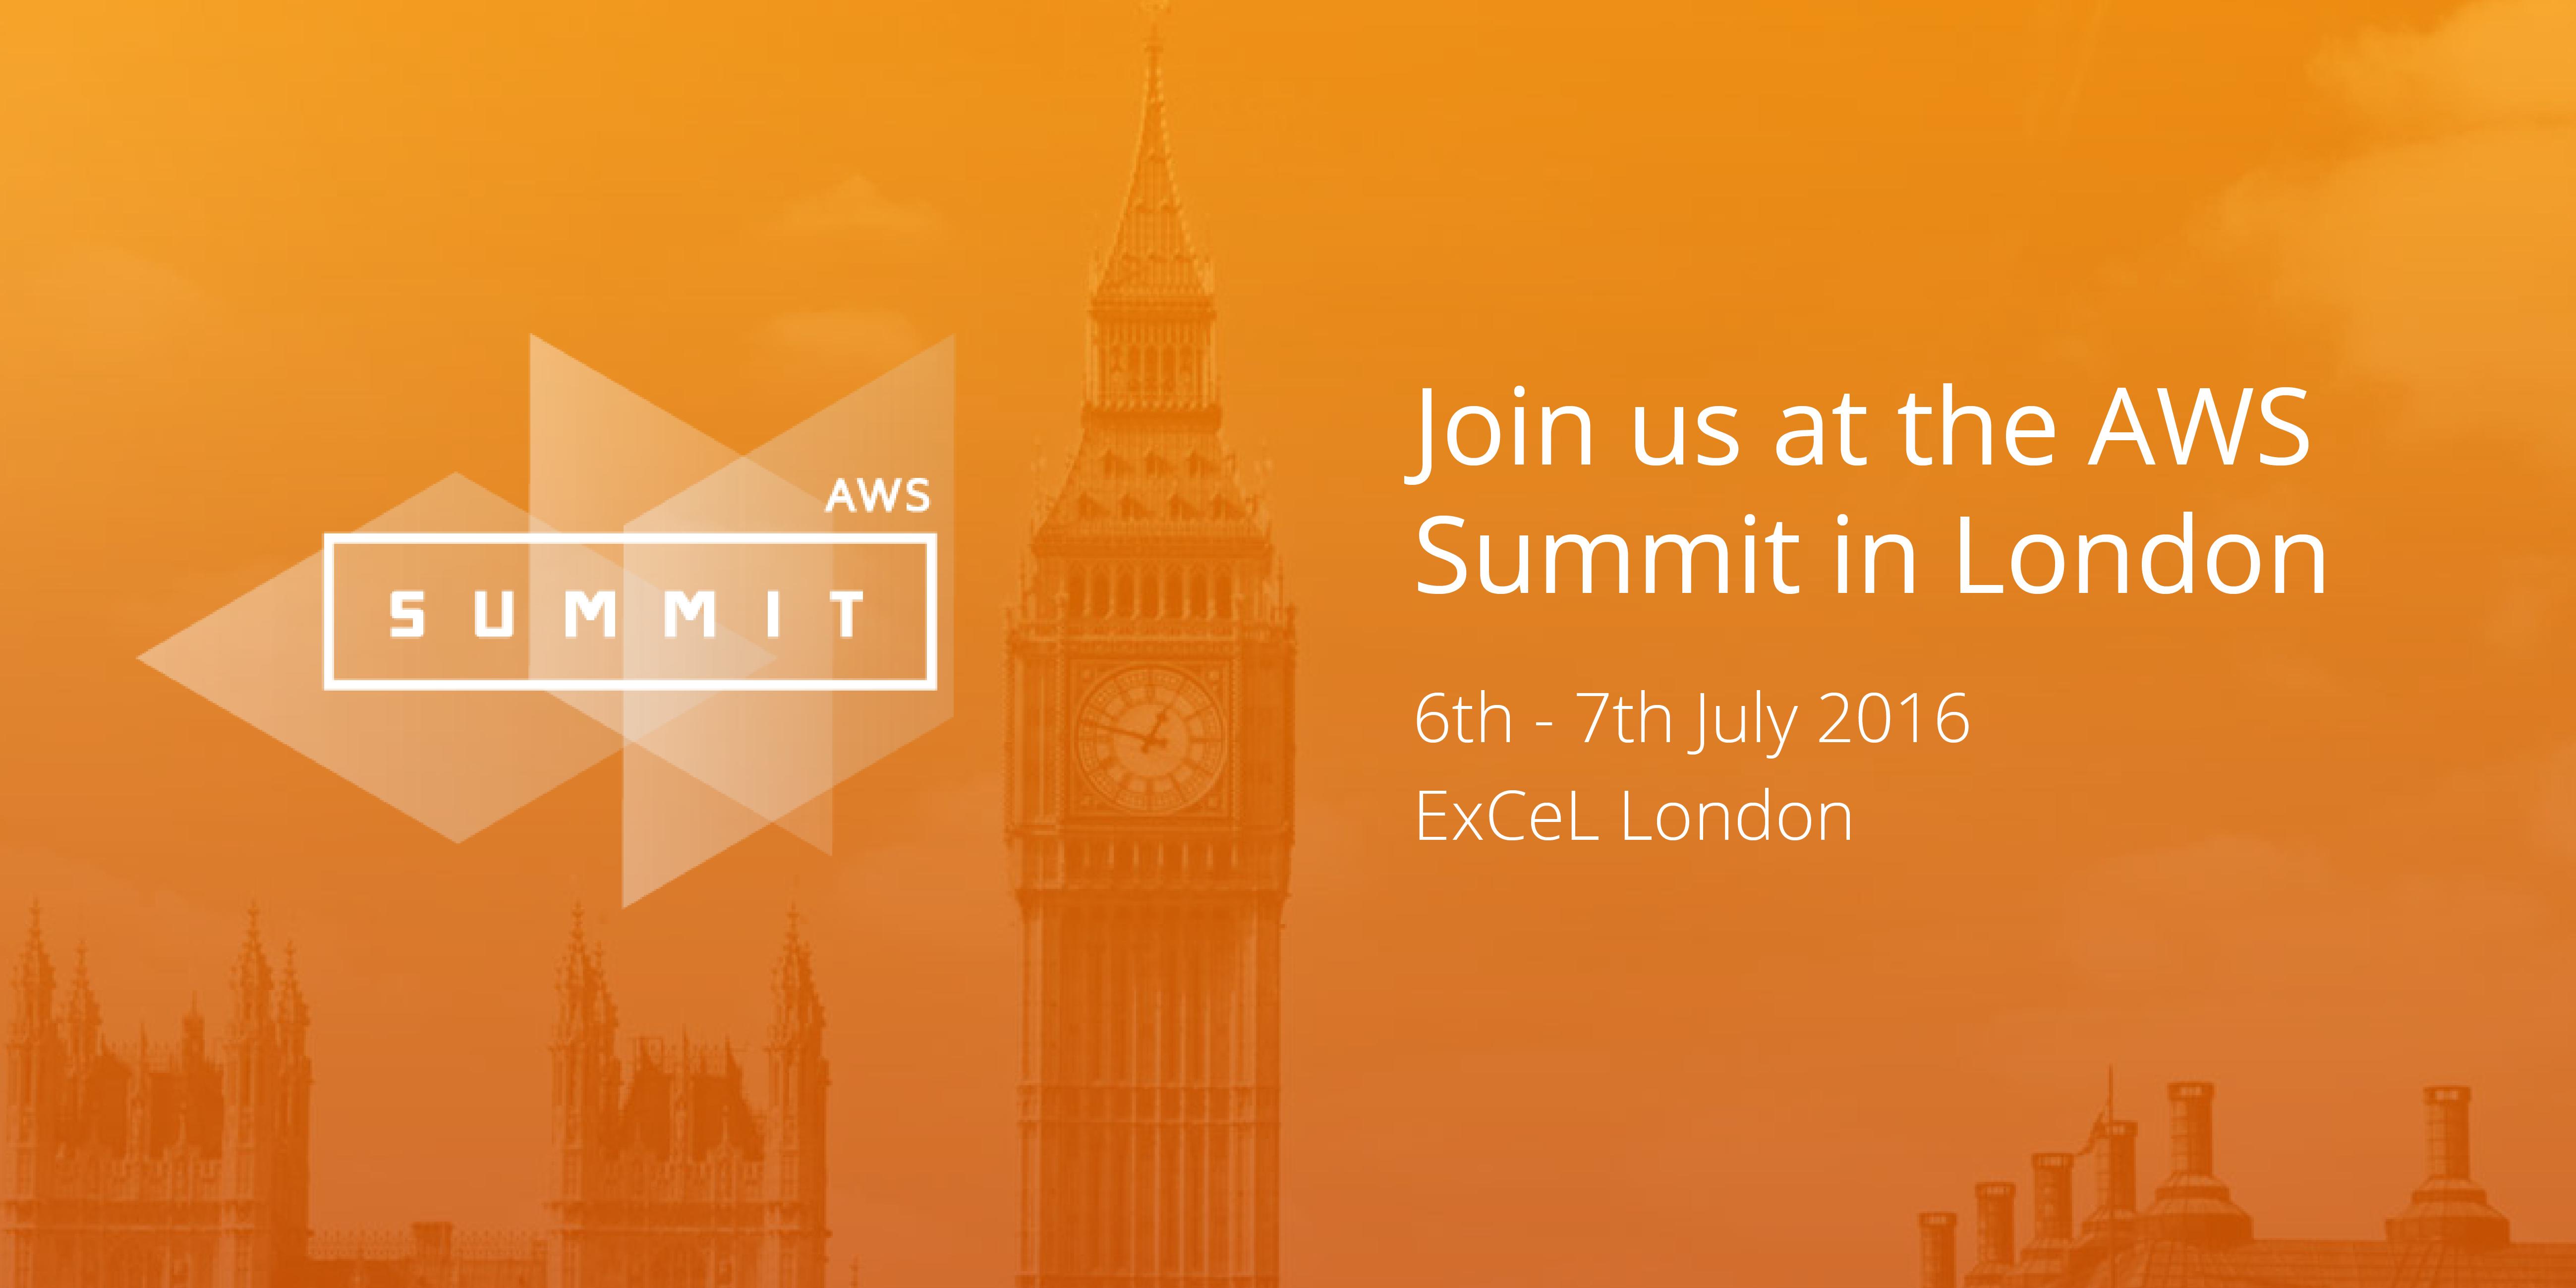 aws summit london